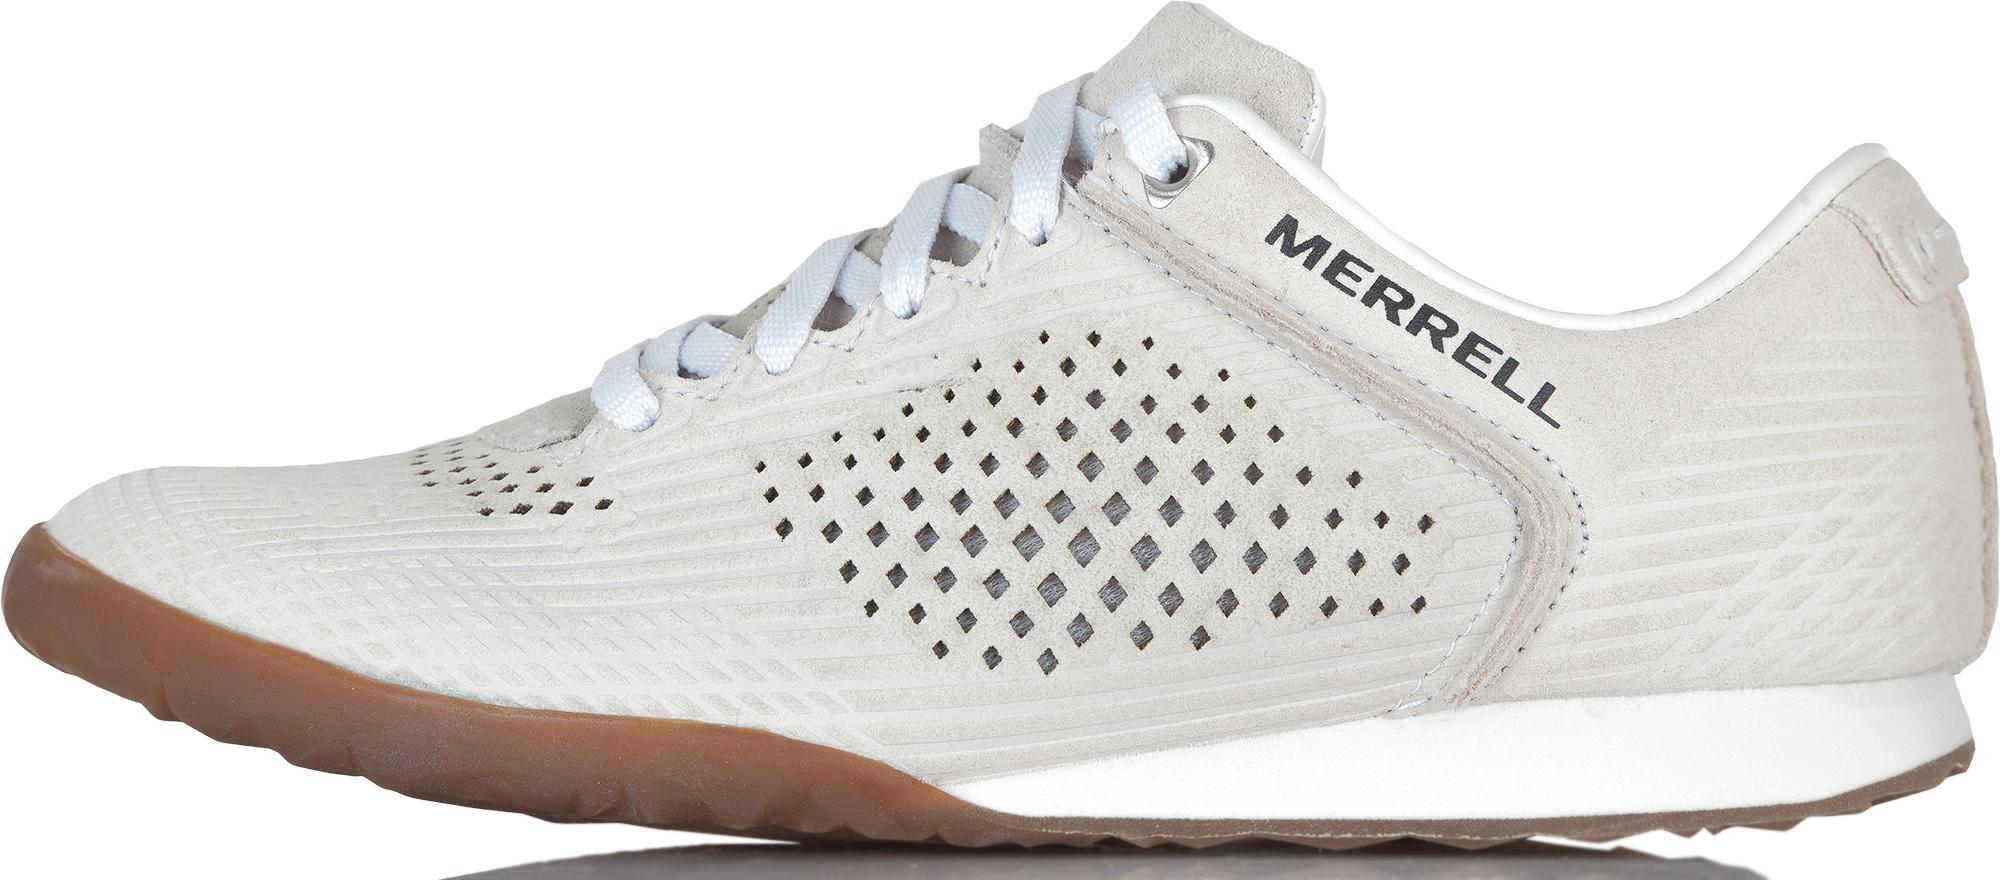 Merrell Полуботинки женские Merrell Civet Sport Breeze